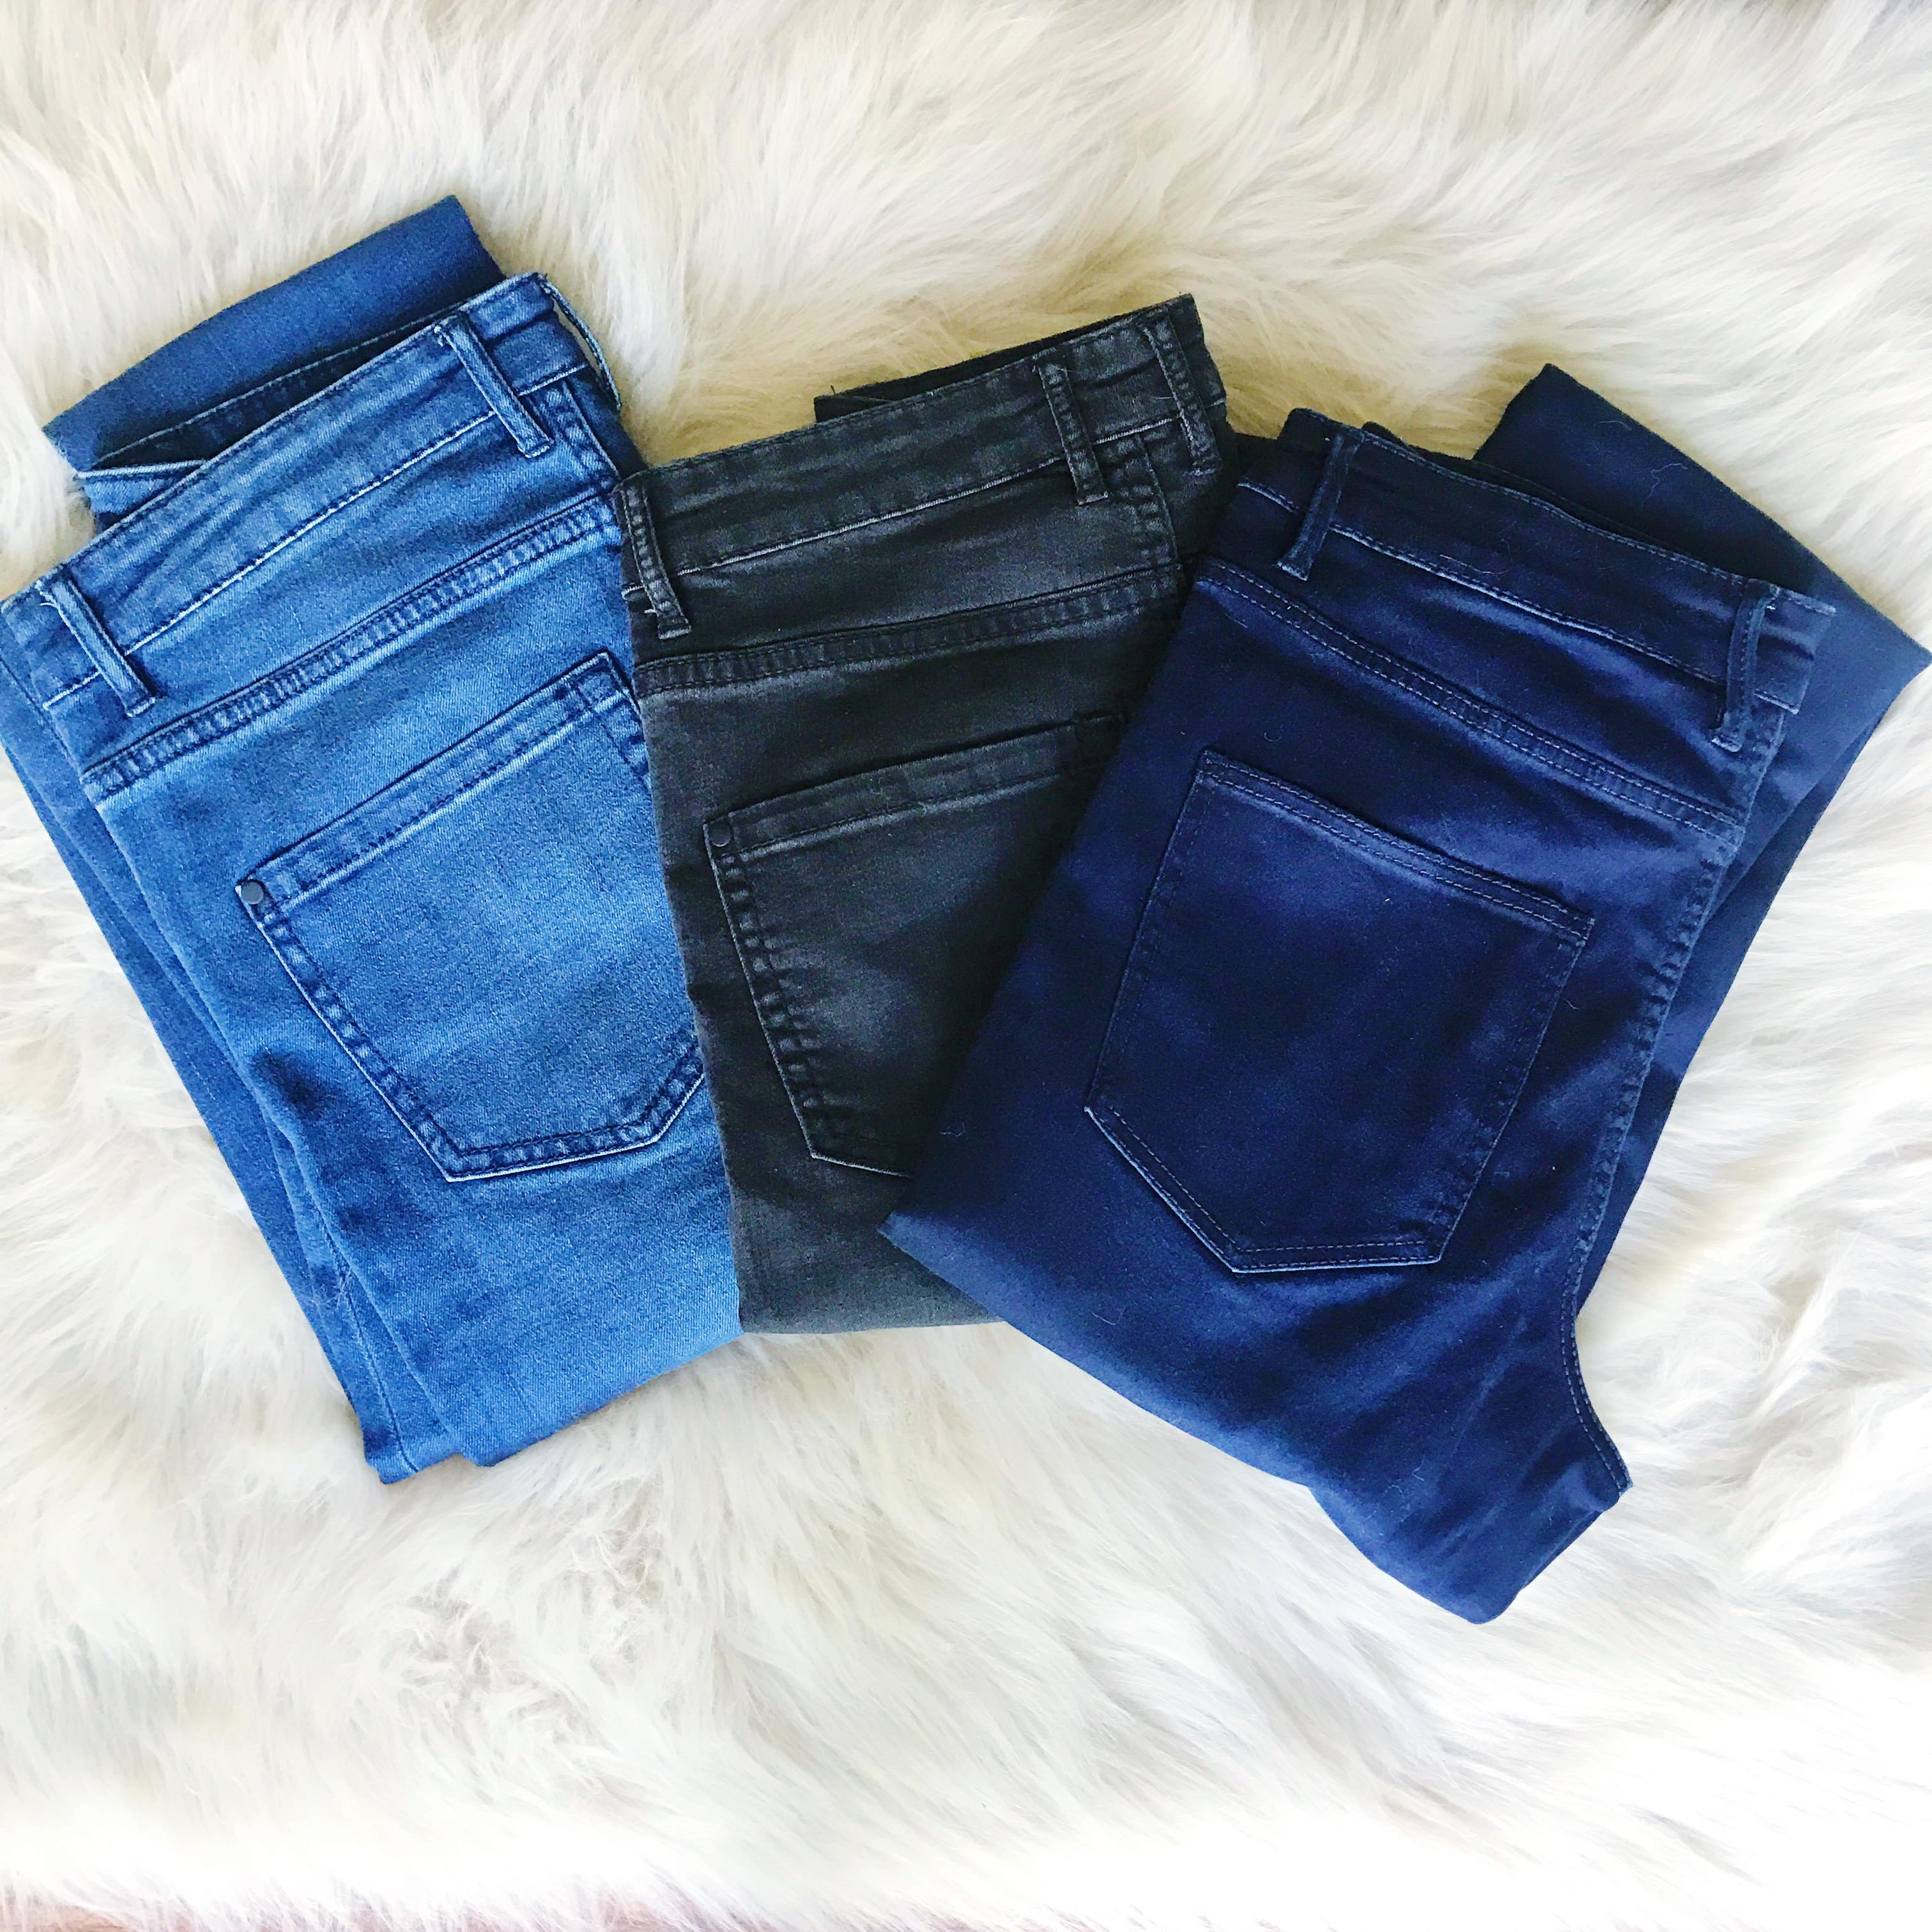 Heidi Klum Jeans Only $9.99